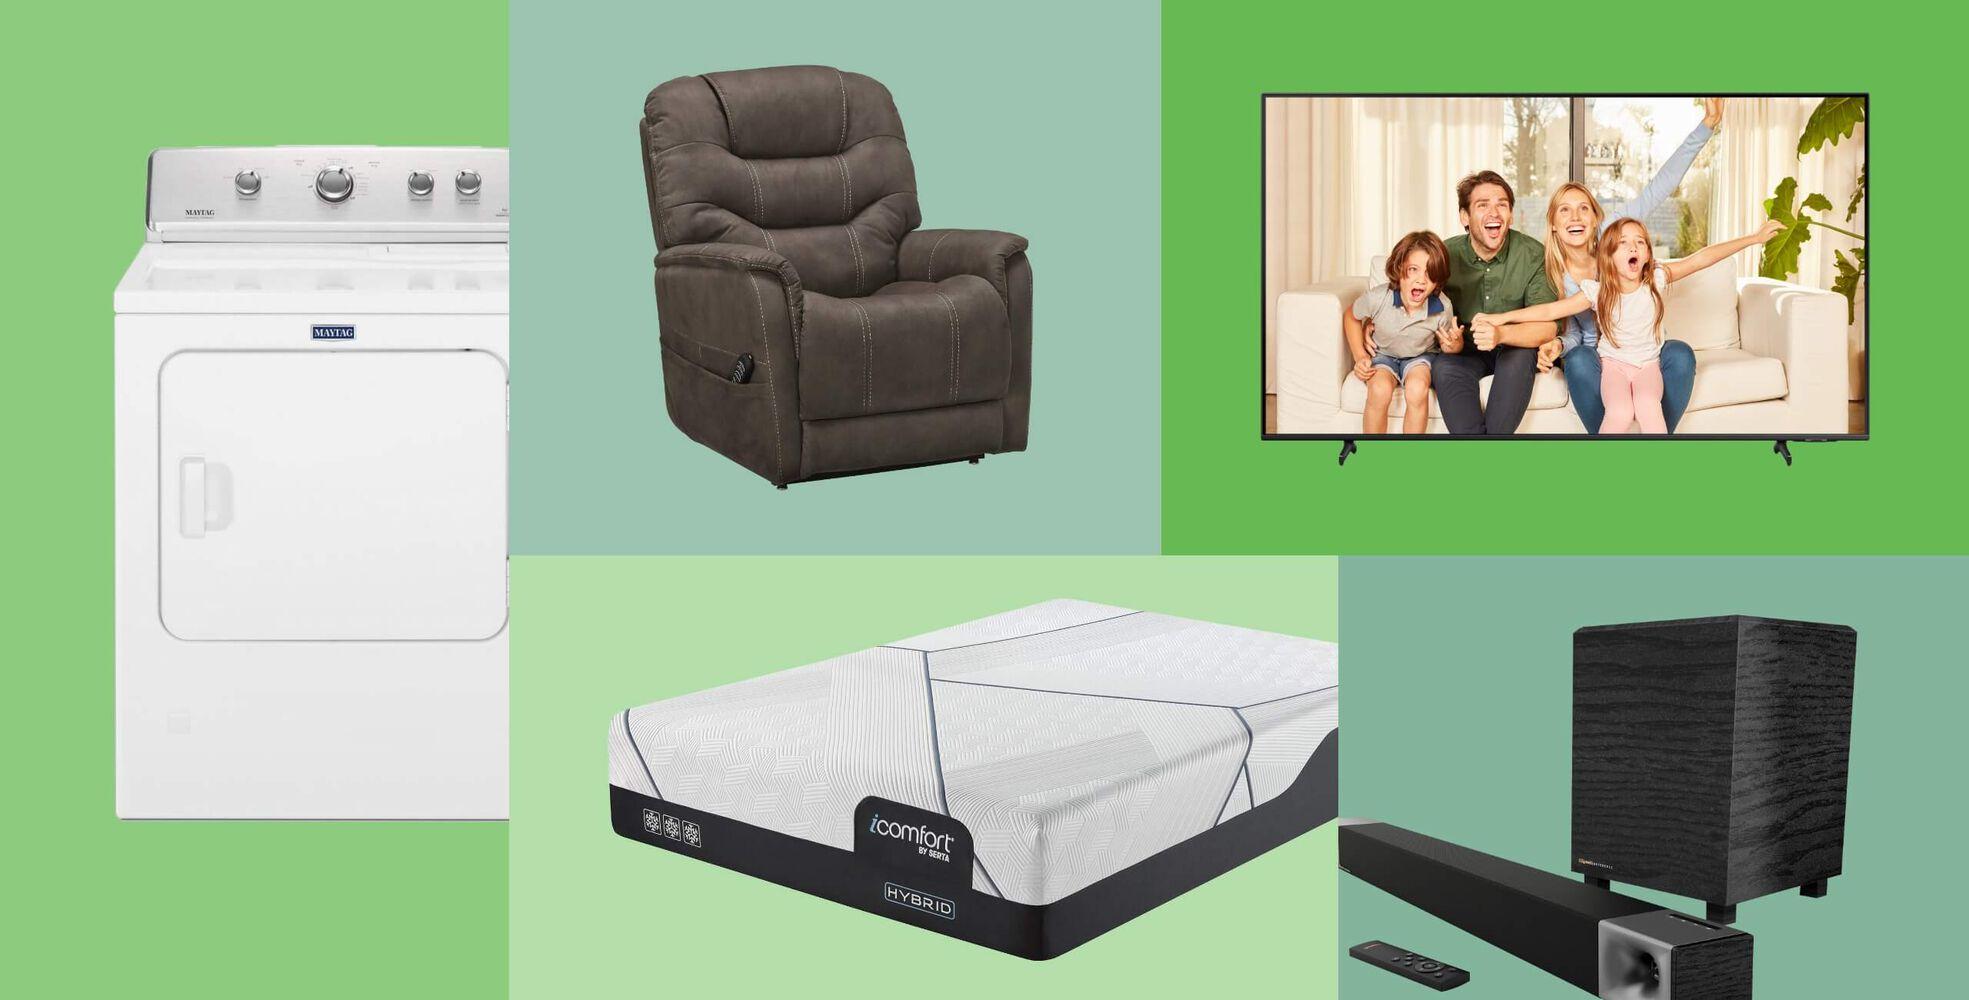 Maytag Electric Dryer, Power Lift Recliner, Serta iComfort Hybrid Mattress, Samsung 4K Smart QLED HDTV, Klipsch Soundbar with Wireless Subwoofer